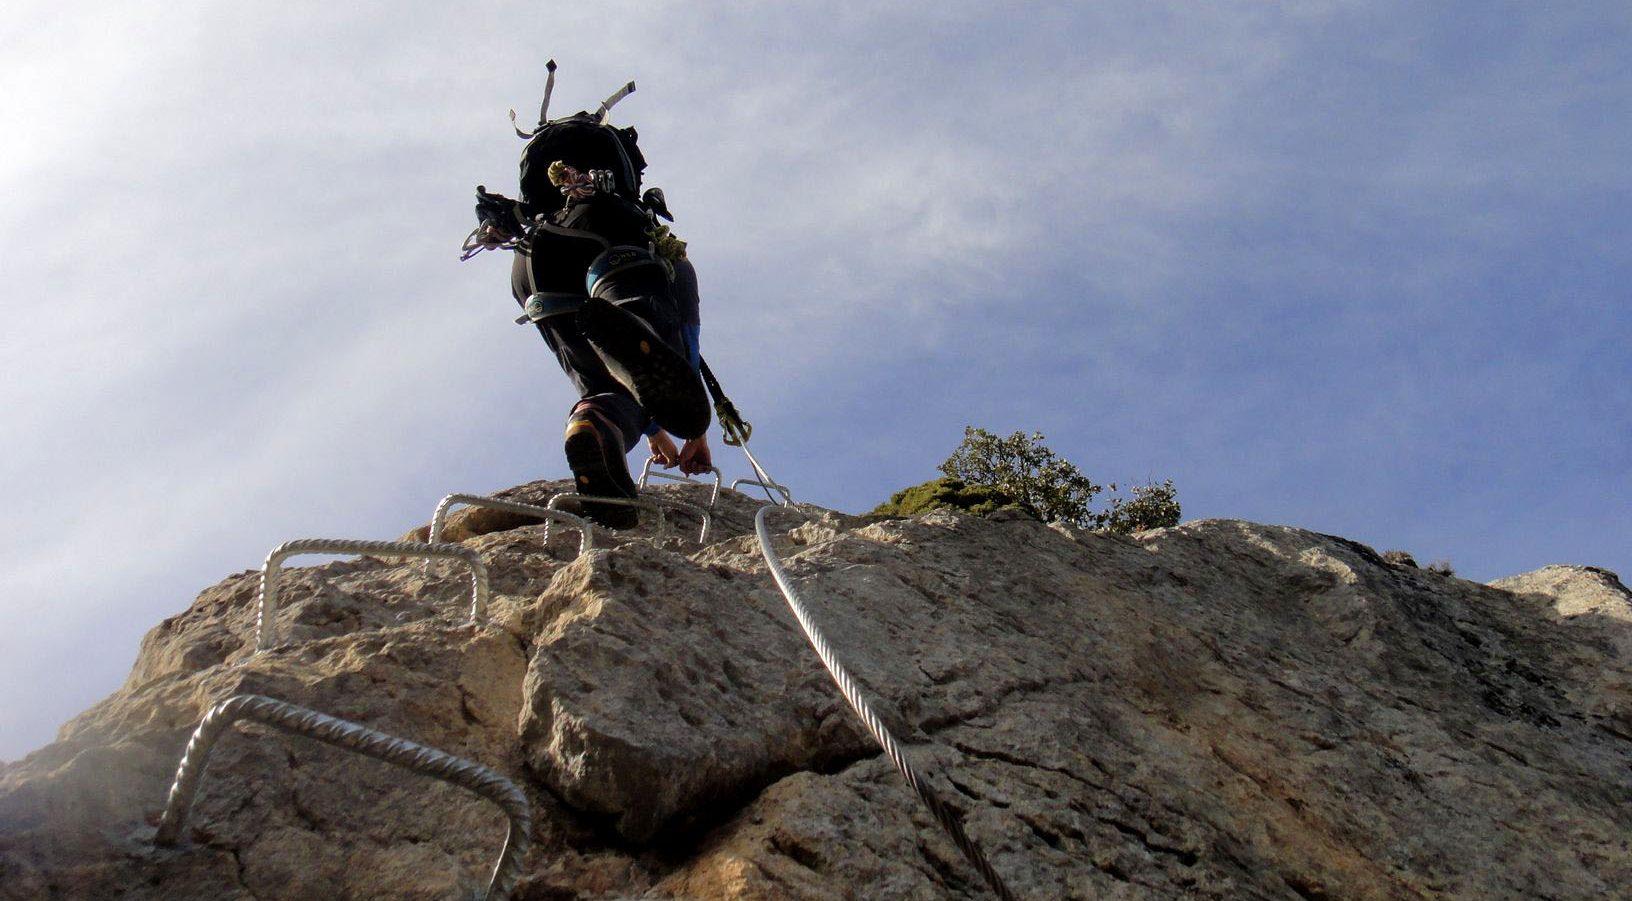 cabecera vias ferratas en pirineos